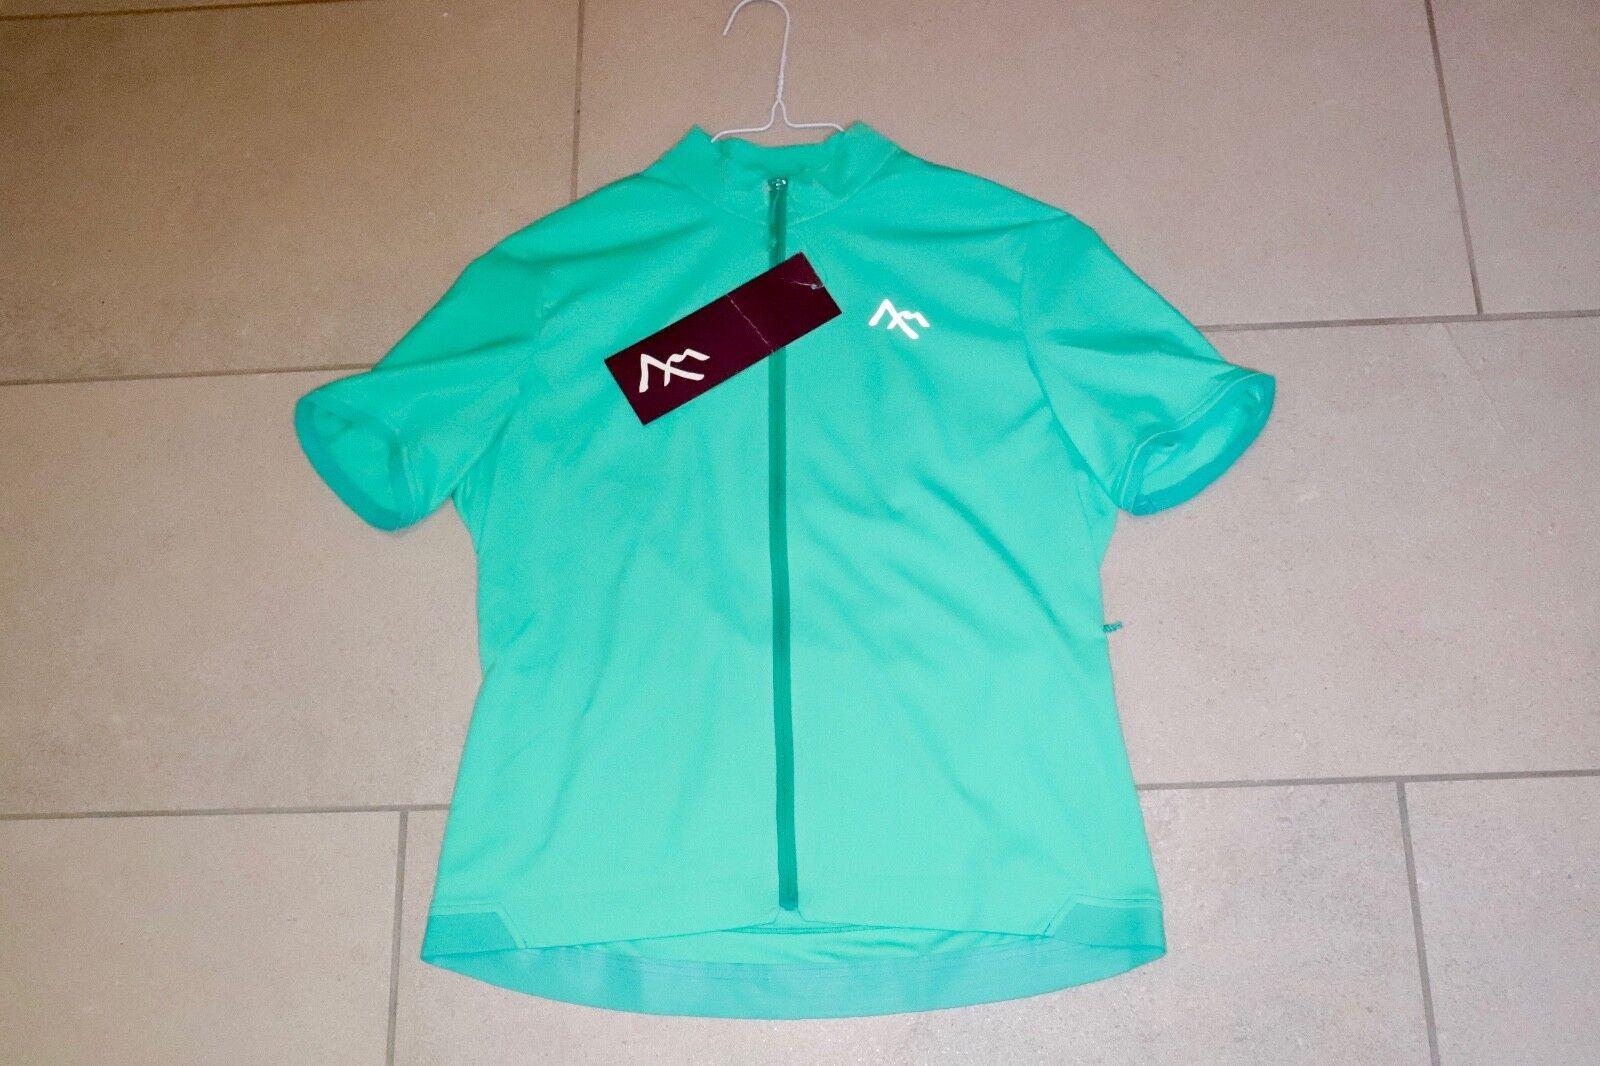 7 Mesh Britannia jersey, W 's Emerald, camiseta VK 100,-€ patrón-venta